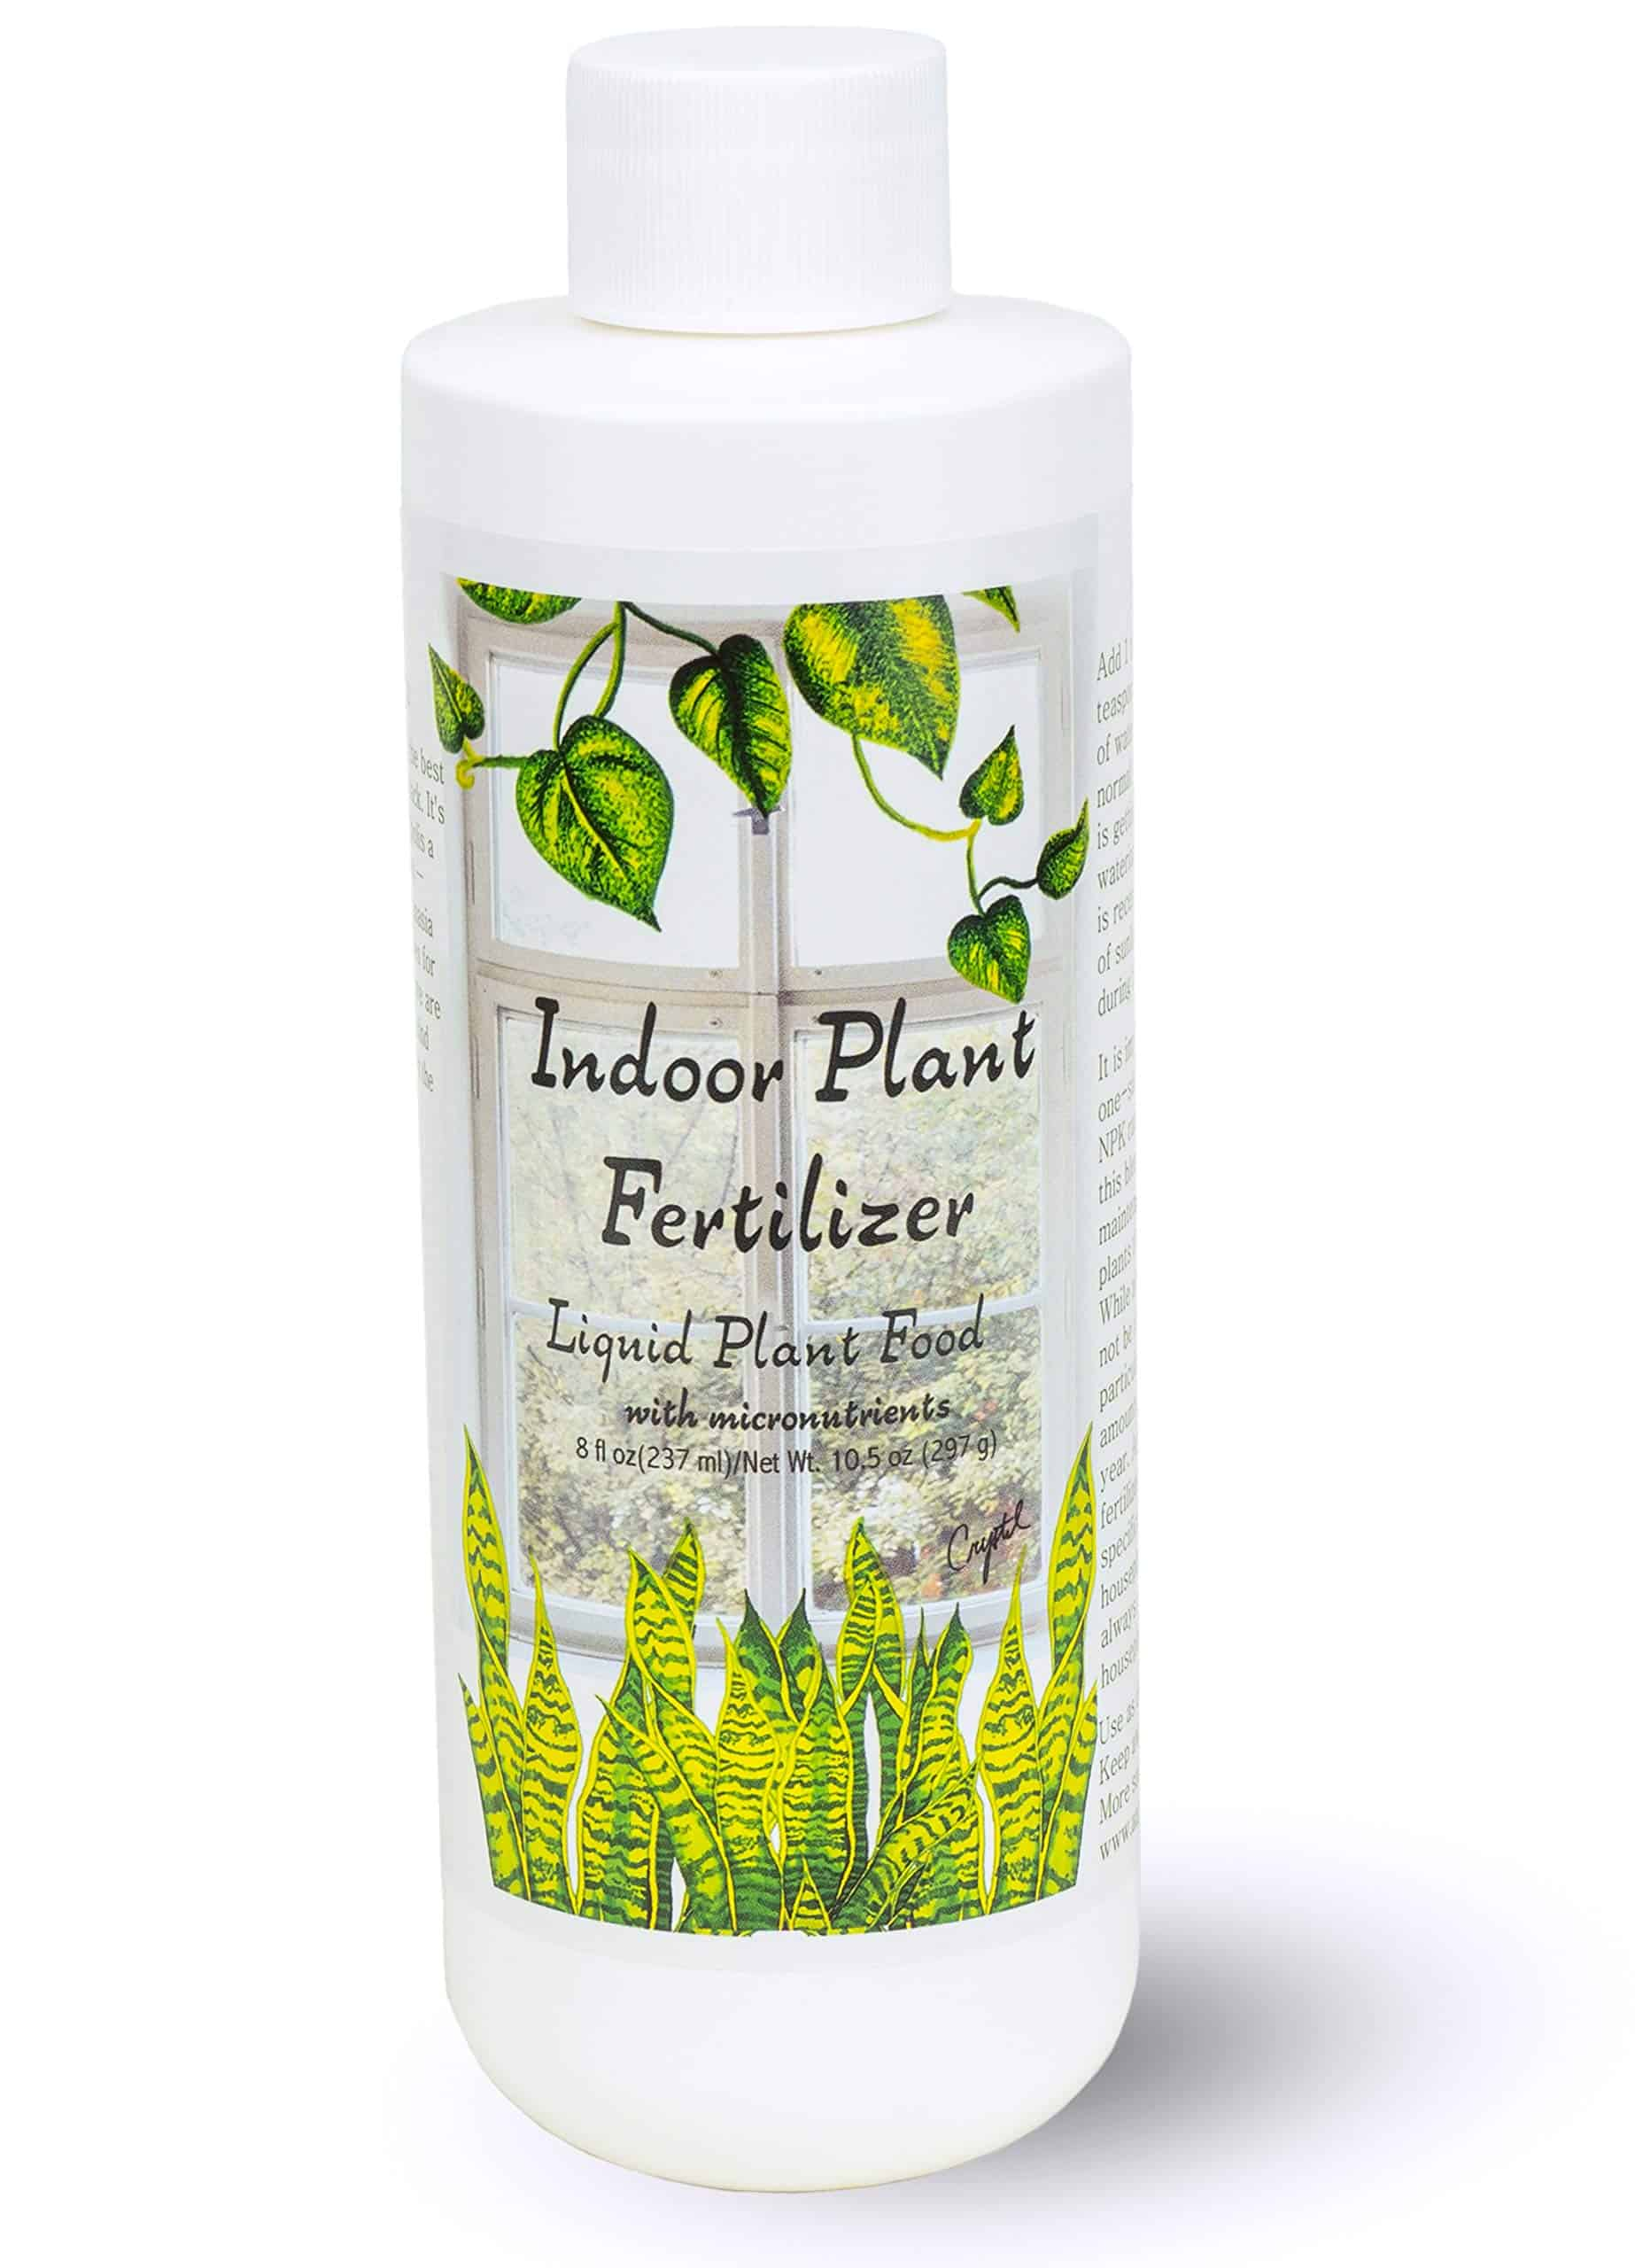 Aquatic Indoor Plant Fertiliser - Best Fertilizer for snake pant - Best fertilizer for indoor plants